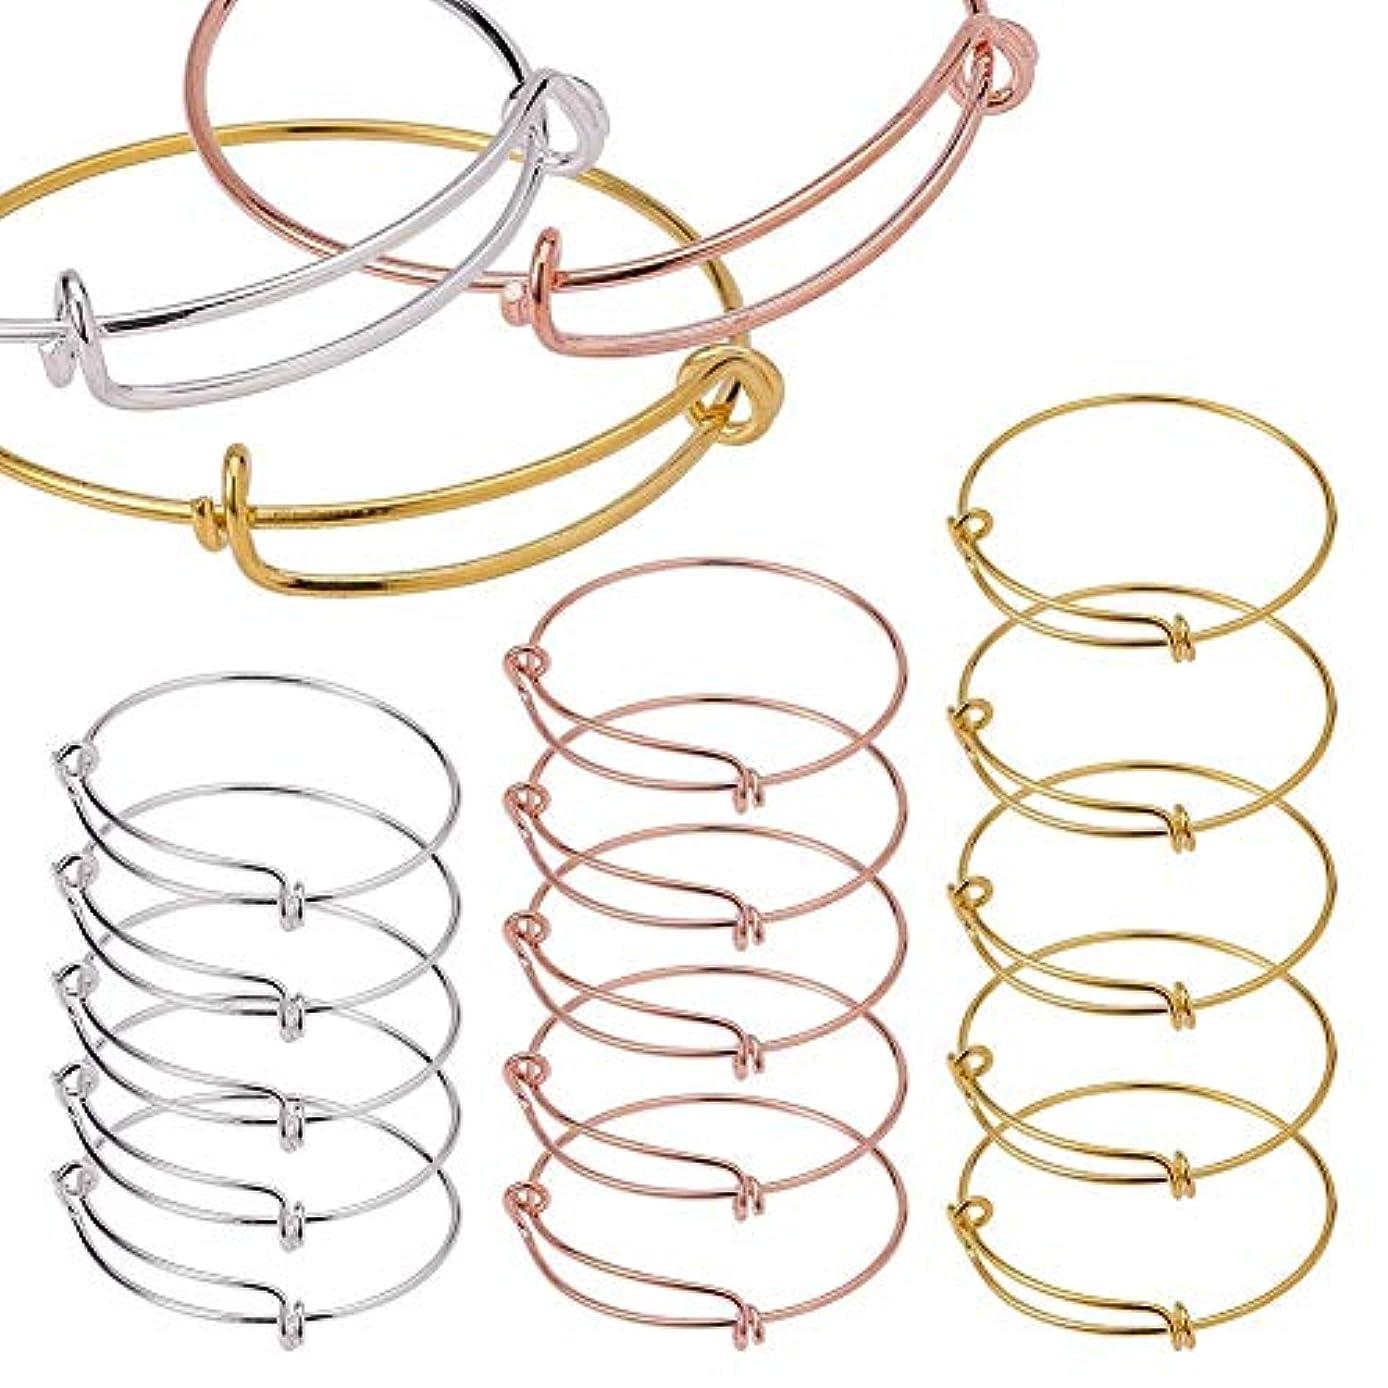 BENECREAT 15PCS/Set Adjustable Wire Blank Bracelet Expandable Bangle for DIY Jewelry Making, 2.5 Inch - Silver & Golden & Rose Gold